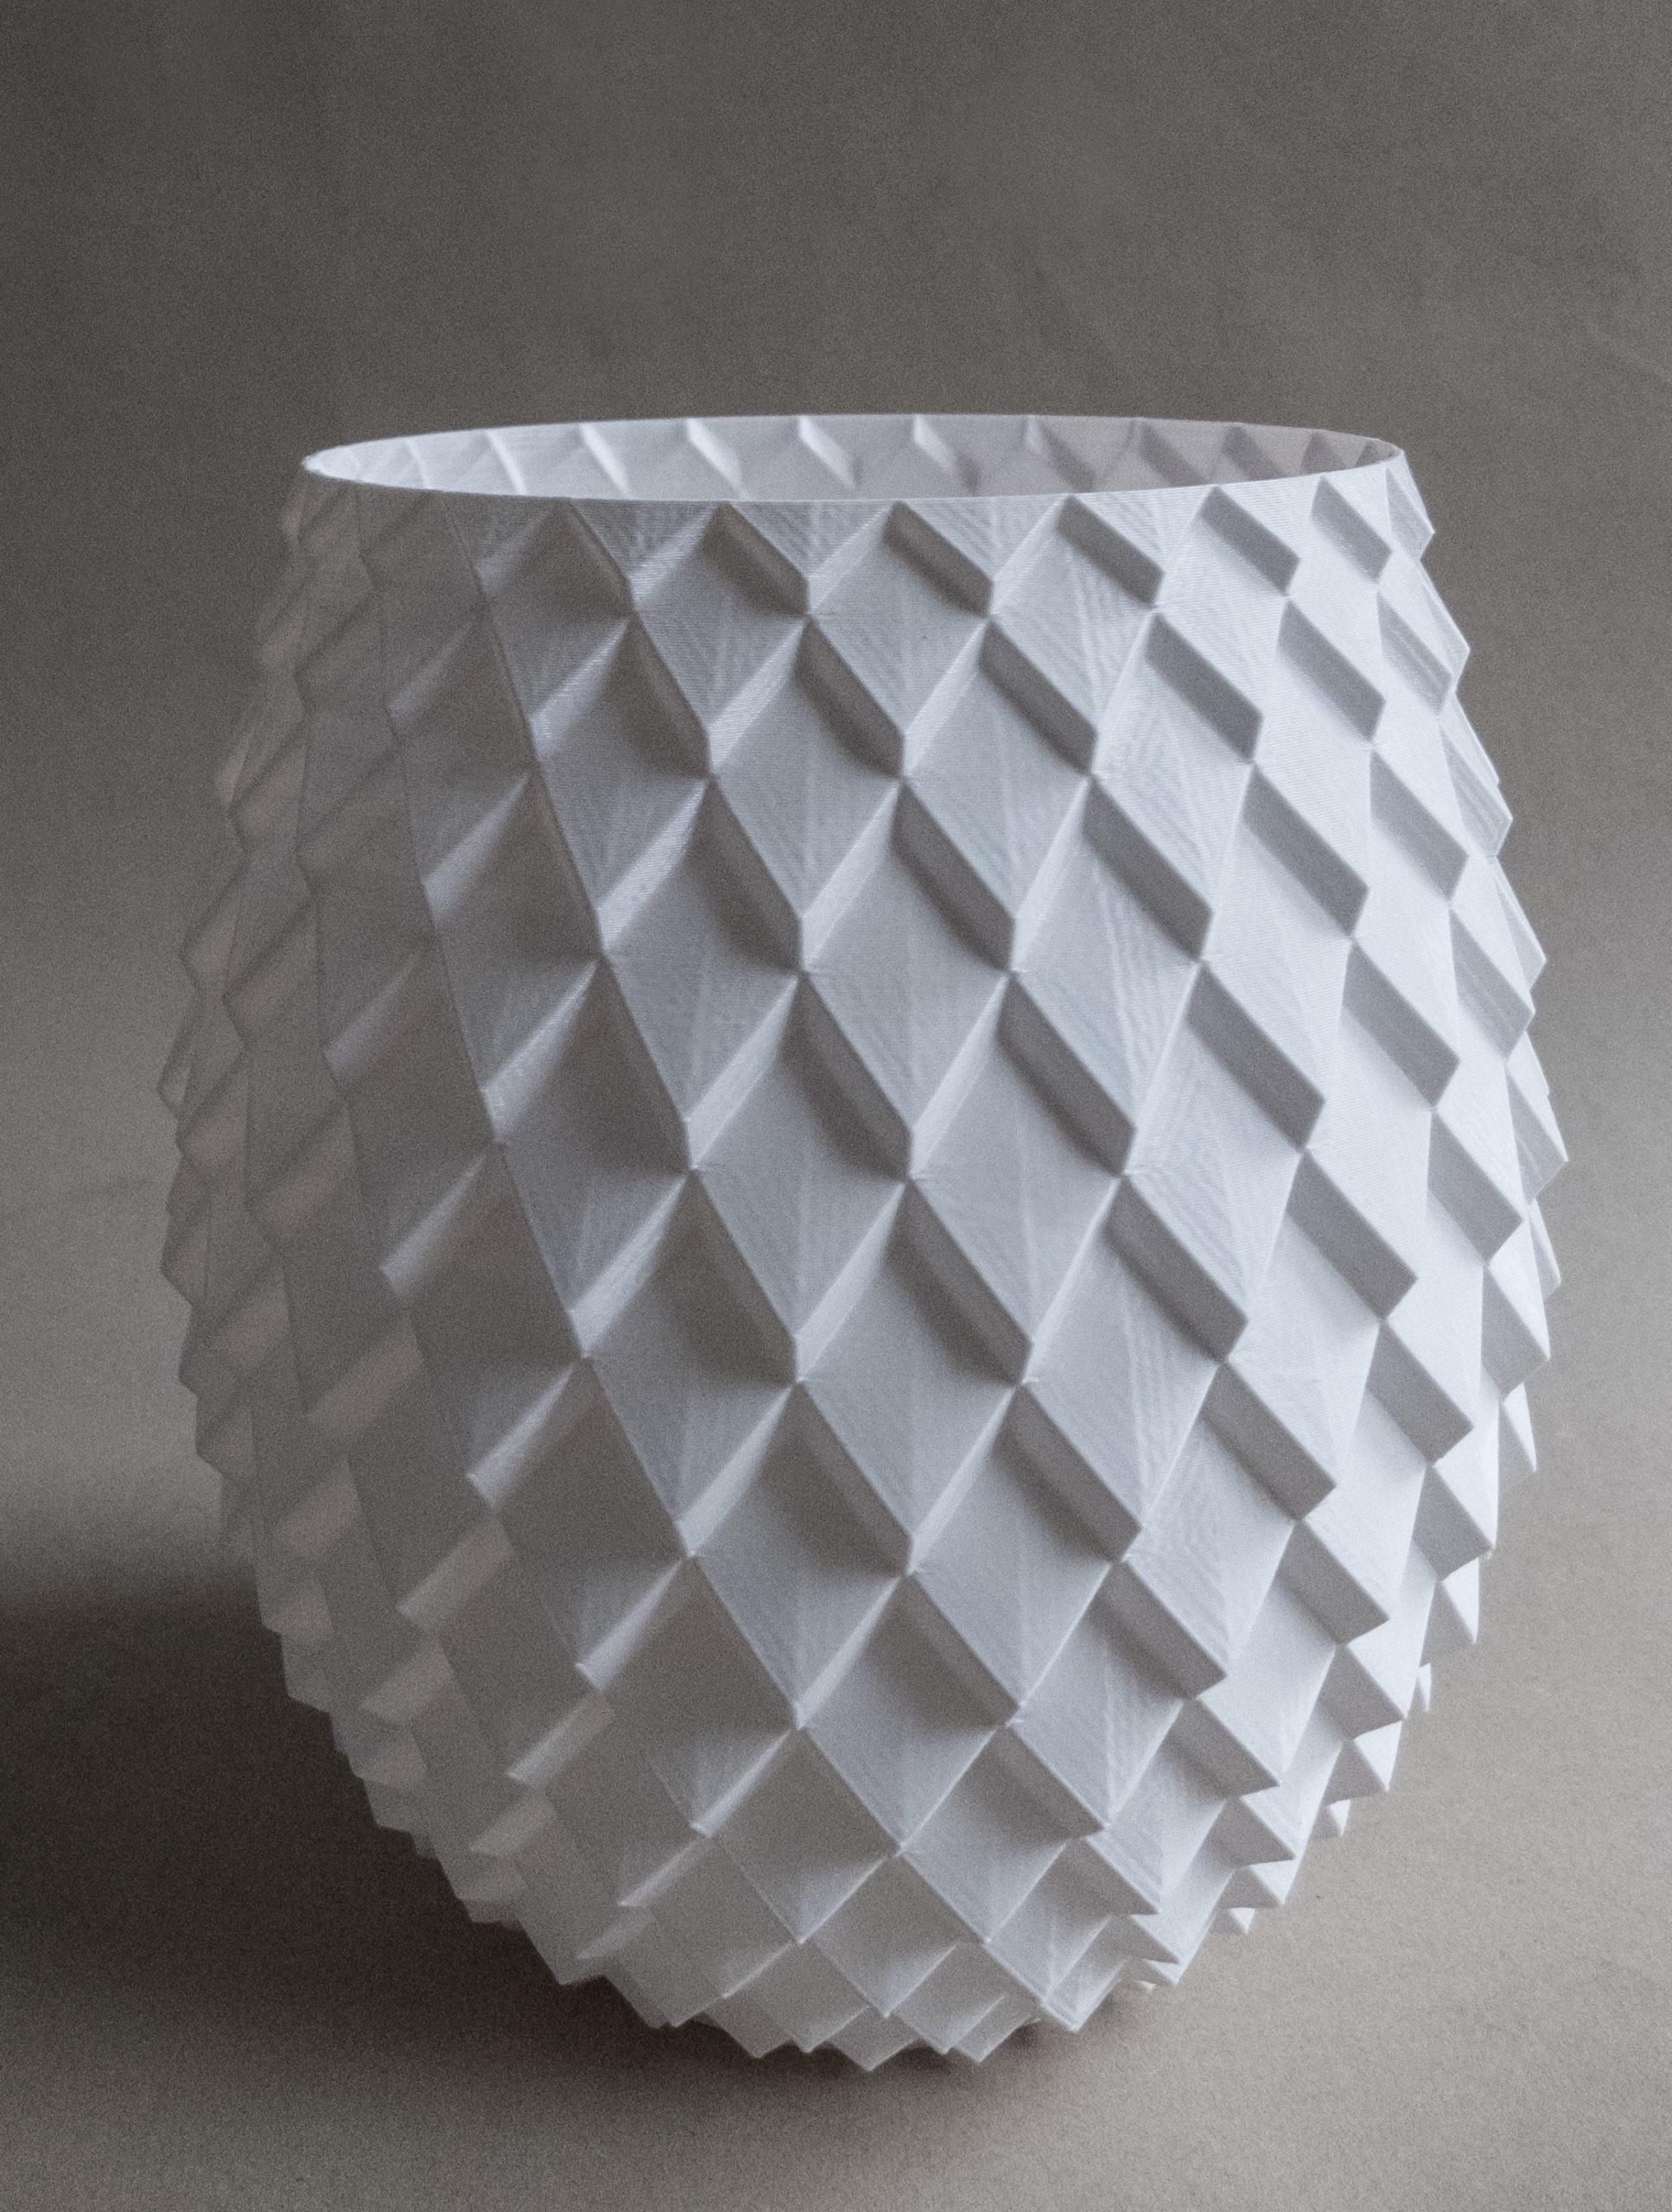 Photo of 3d printed parametric vase design